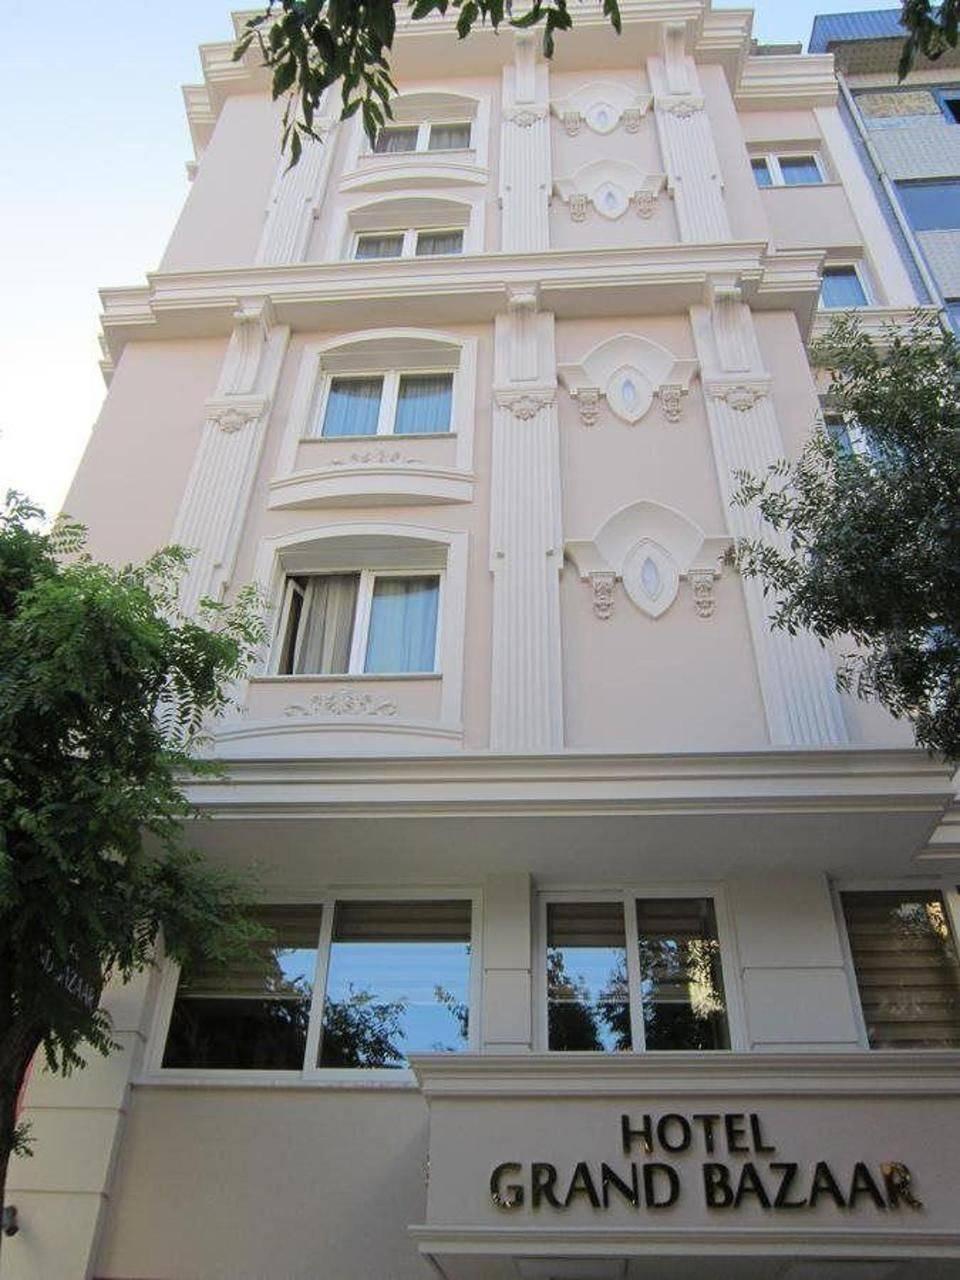 Grand Bazaar Otel, İstanbul, Fatih, 26890